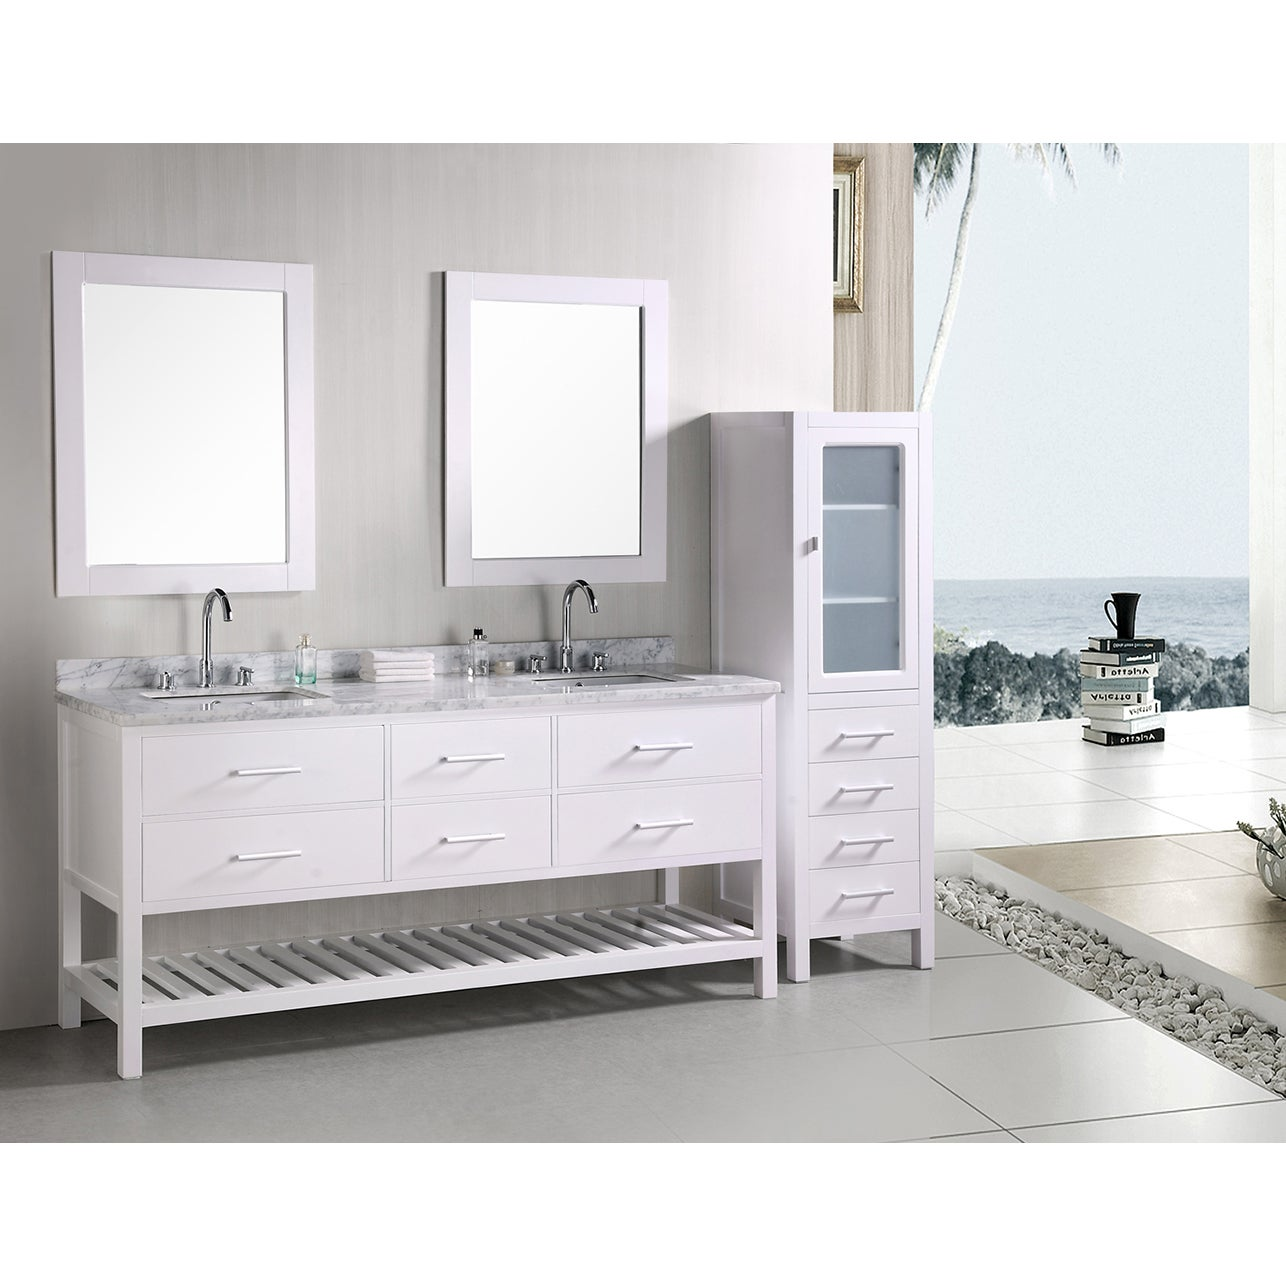 Shop design element london 72 inch double sink bathroom vanity set free shipping today overstock com 6519313